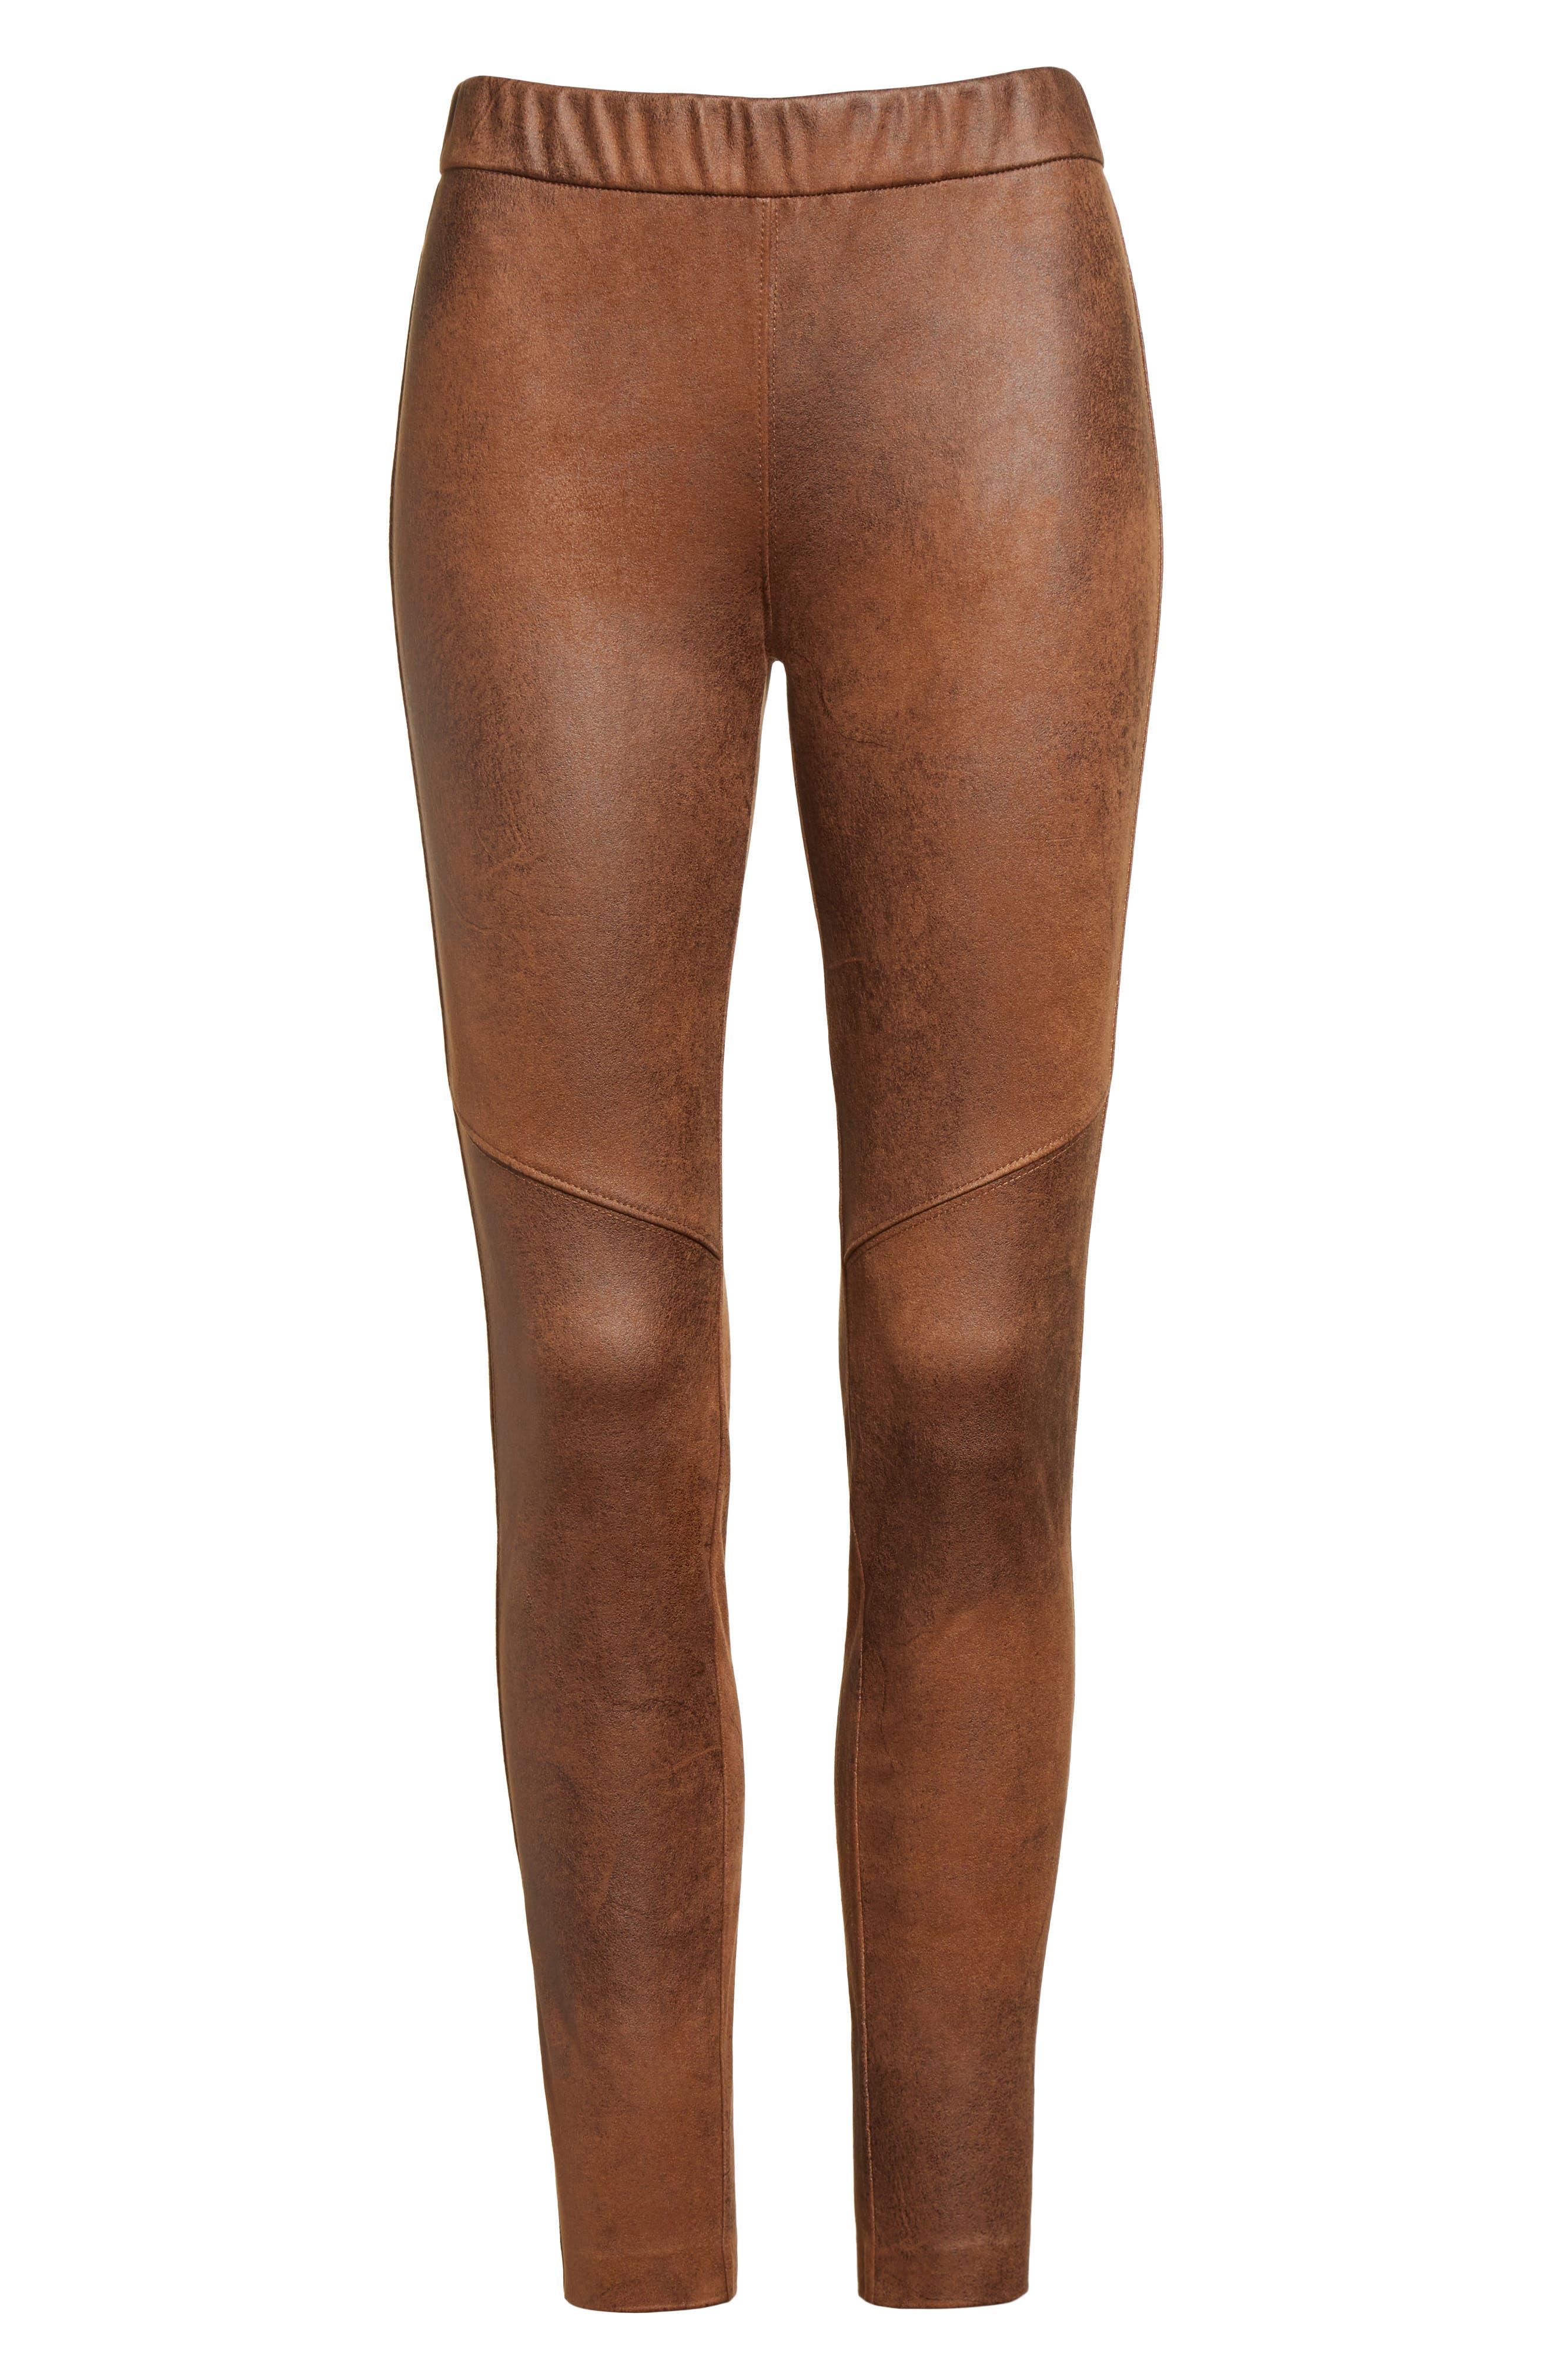 Free People Faux Leather Leggings